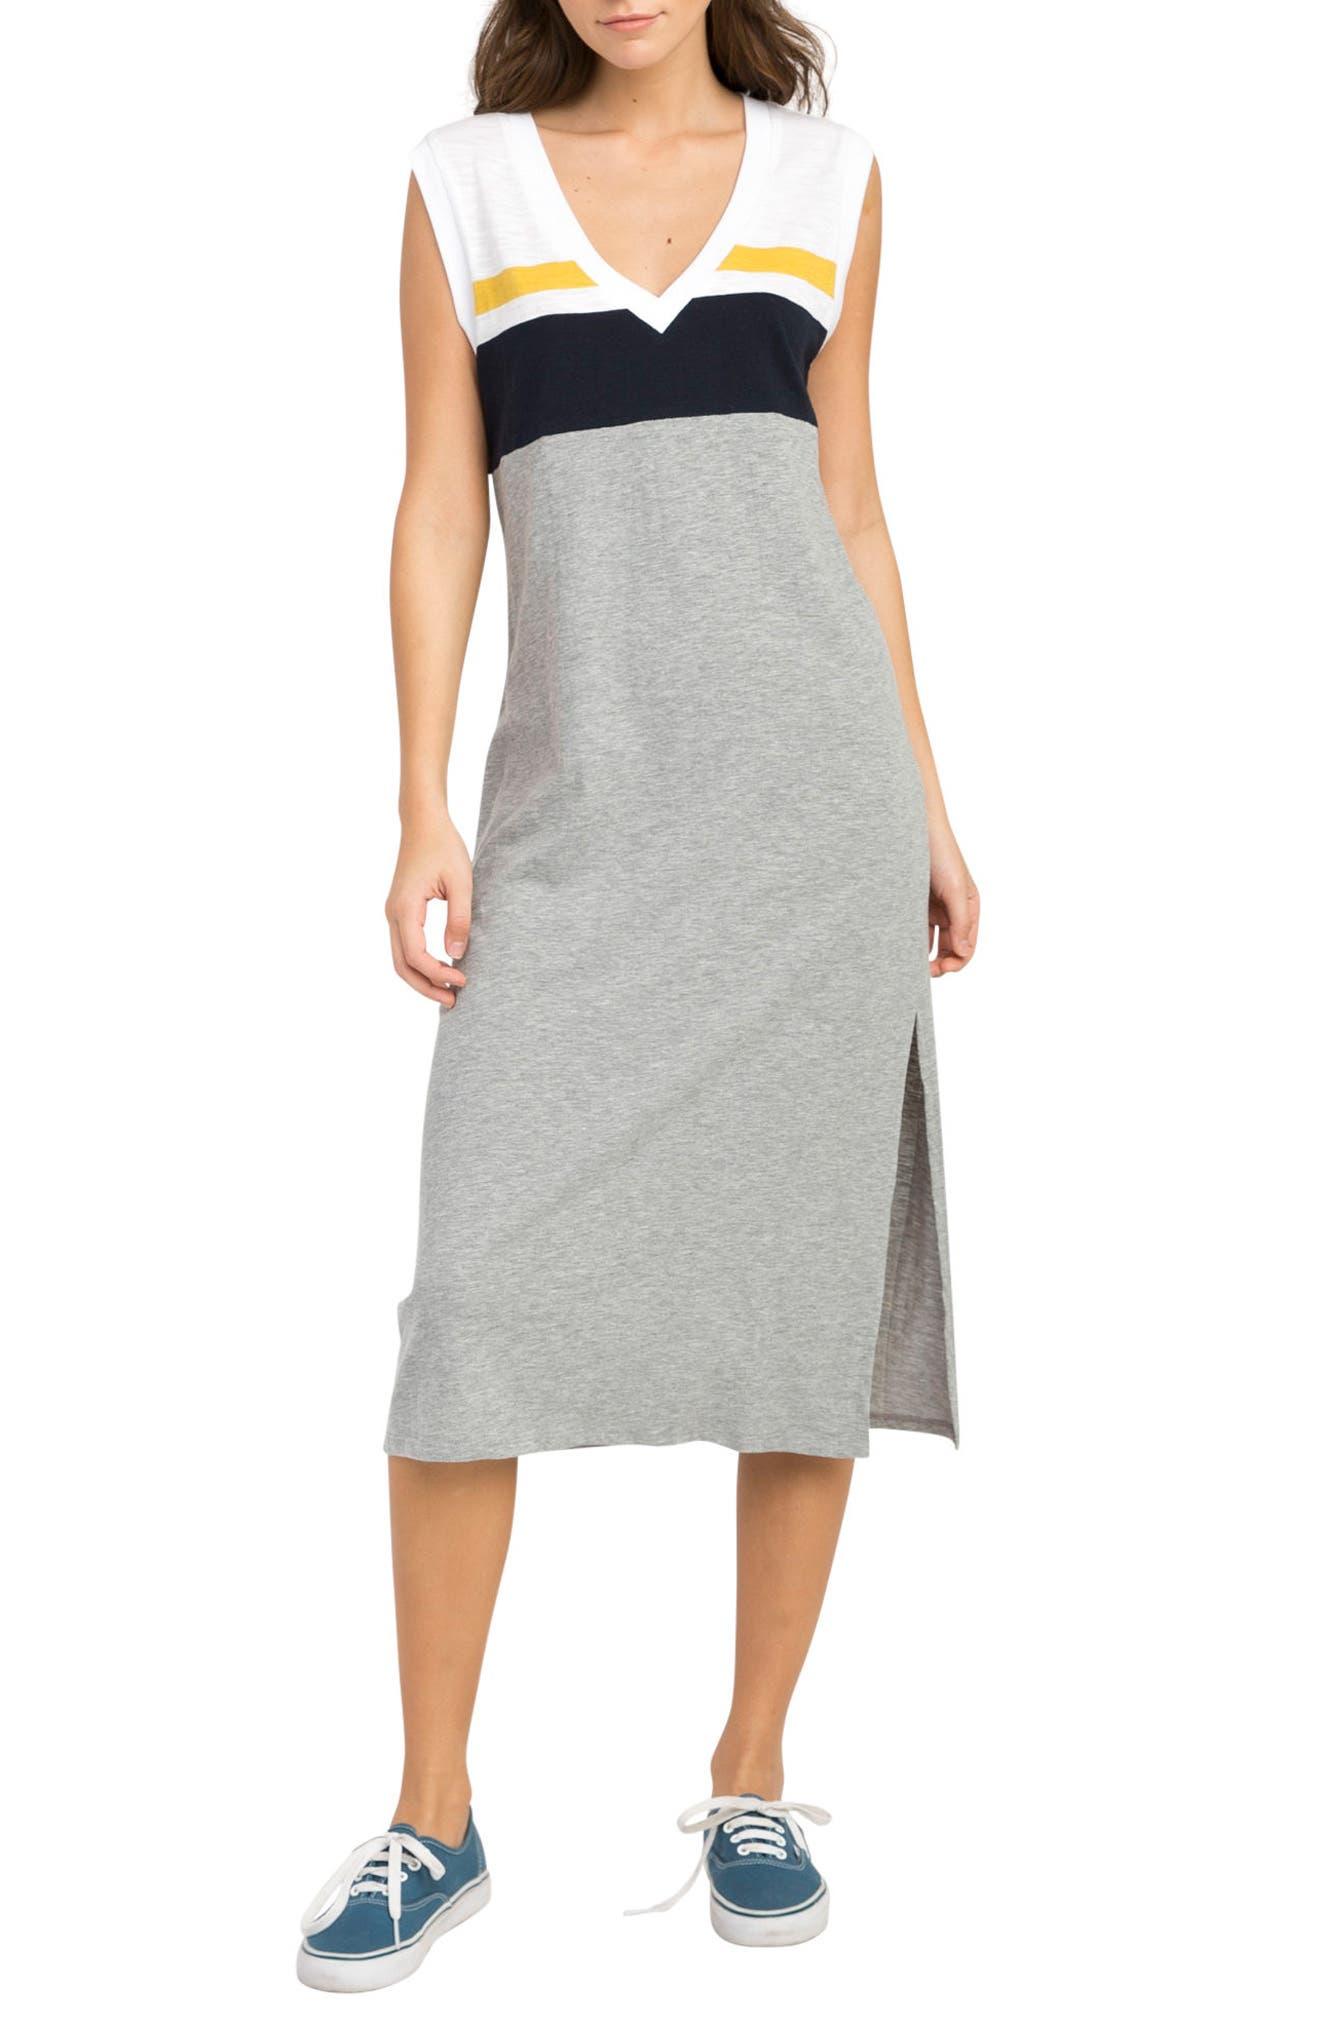 Scorekeeper Midi Dress,                         Main,                         color, 054